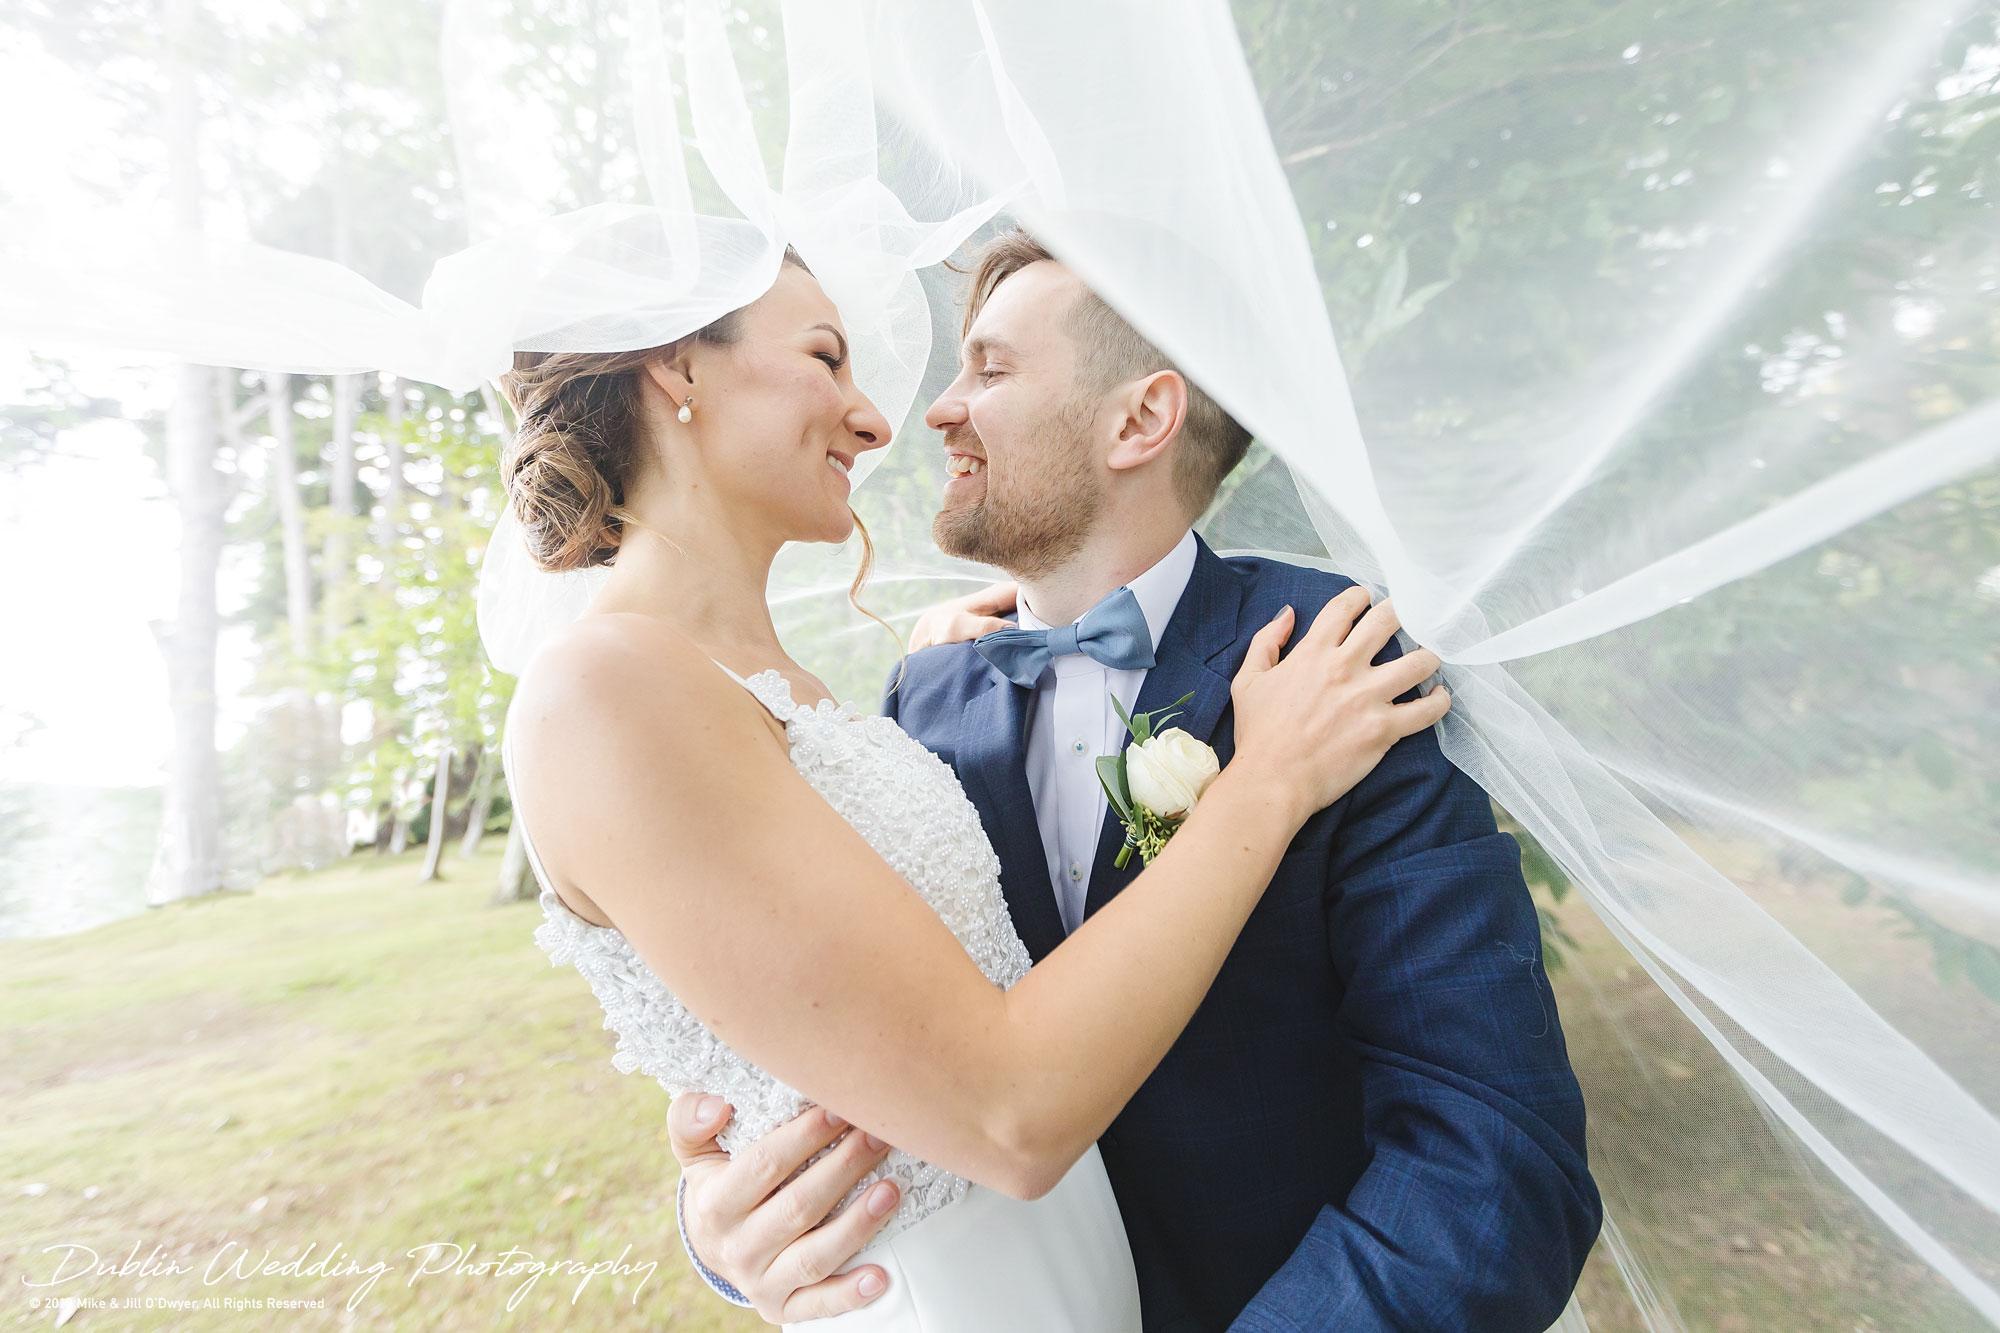 wedding-photographers-wicklow-tinakilly-house-2019-44.jpg